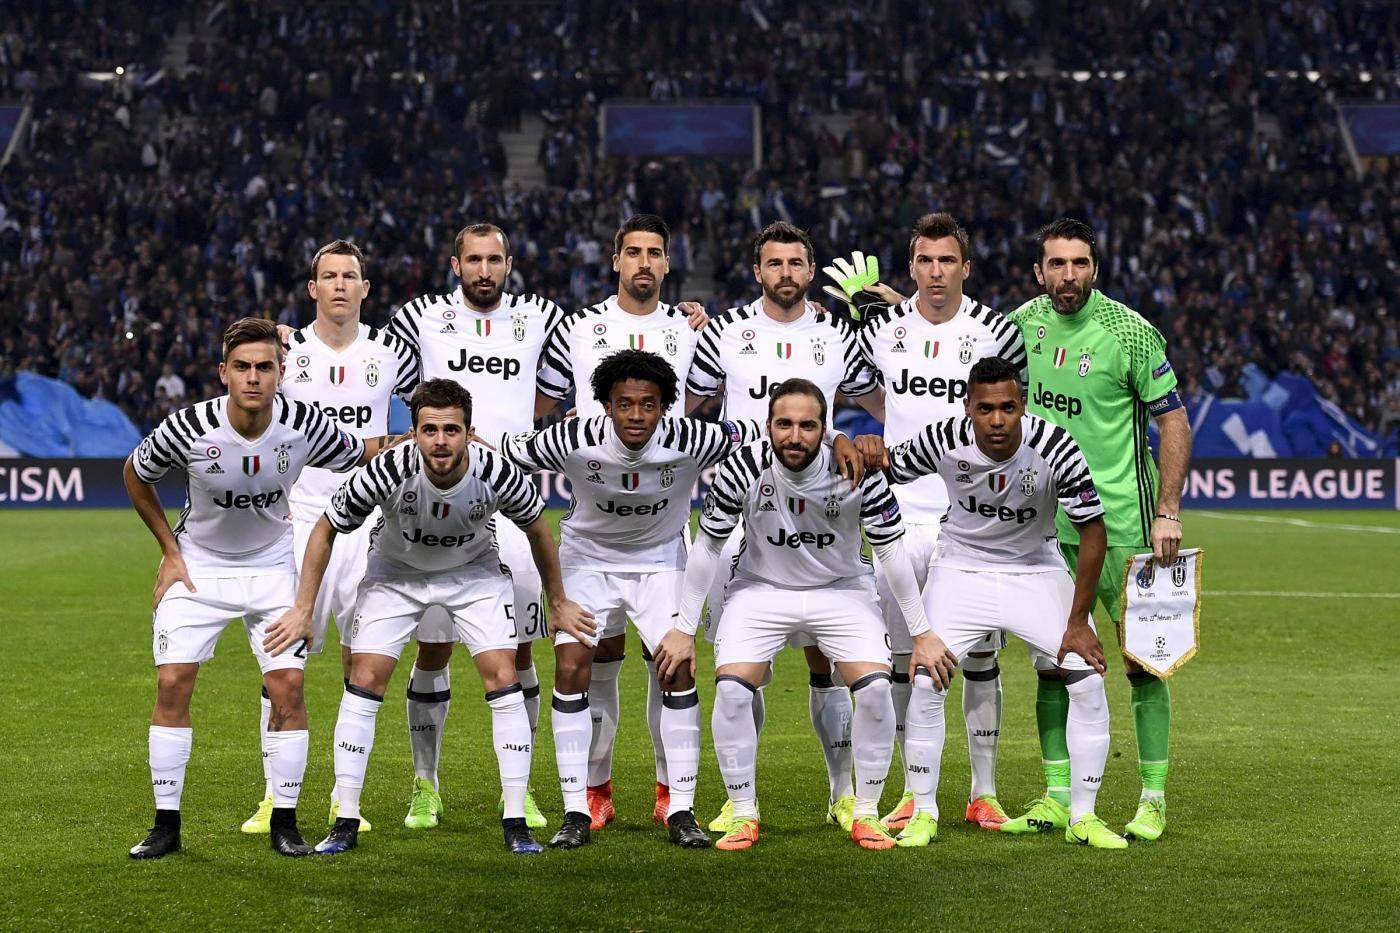 Champions League, Porto vs Juventus 0 2